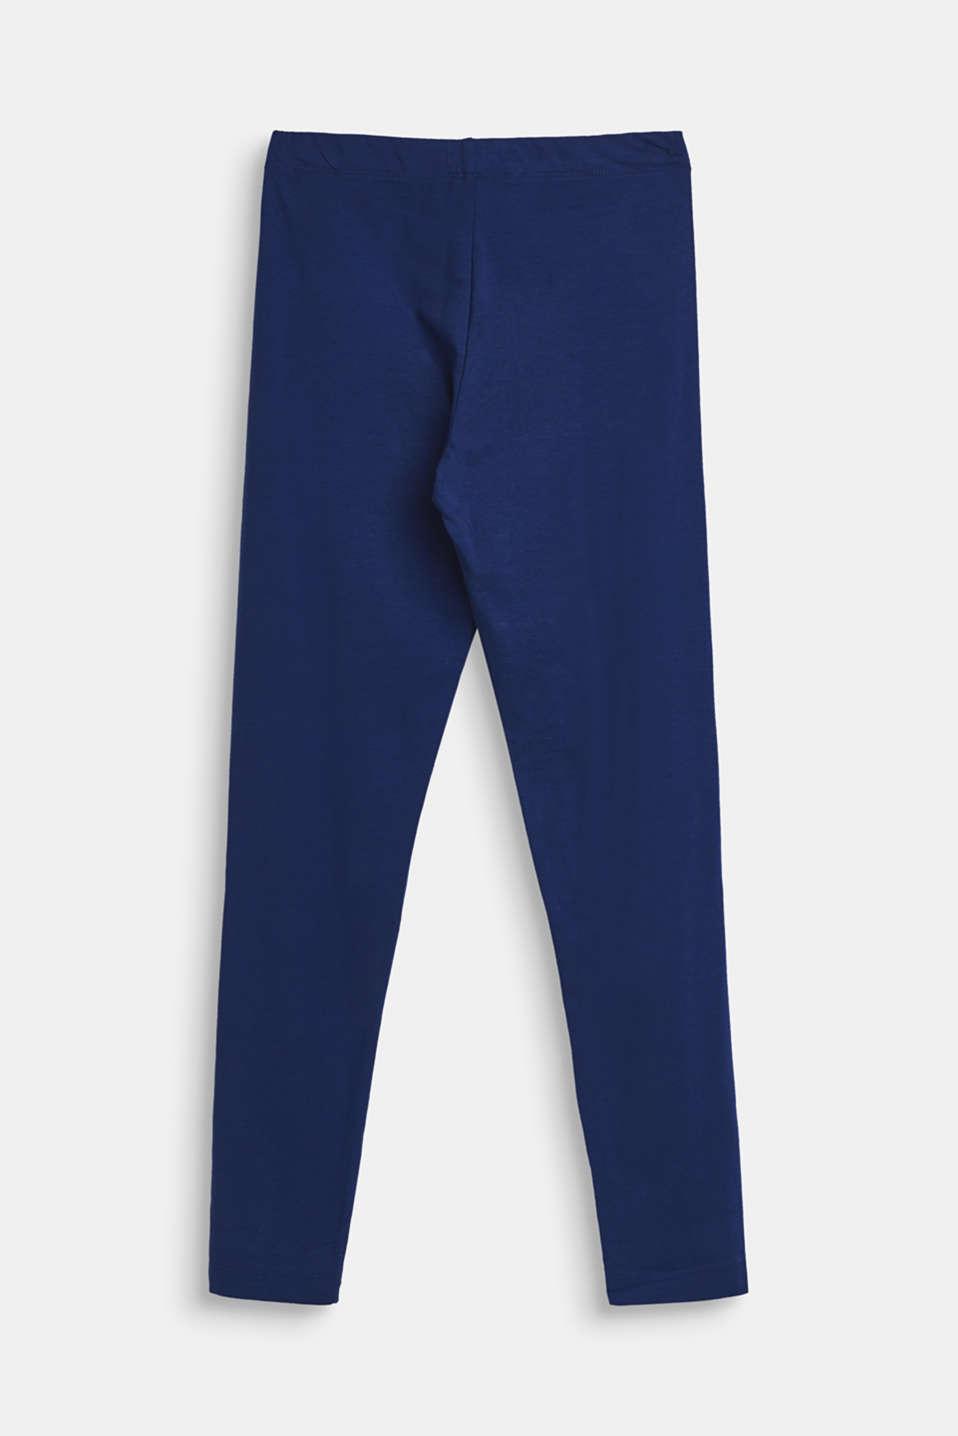 Basic stretch cotton leggings, LCMARINE BLUE, detail image number 1